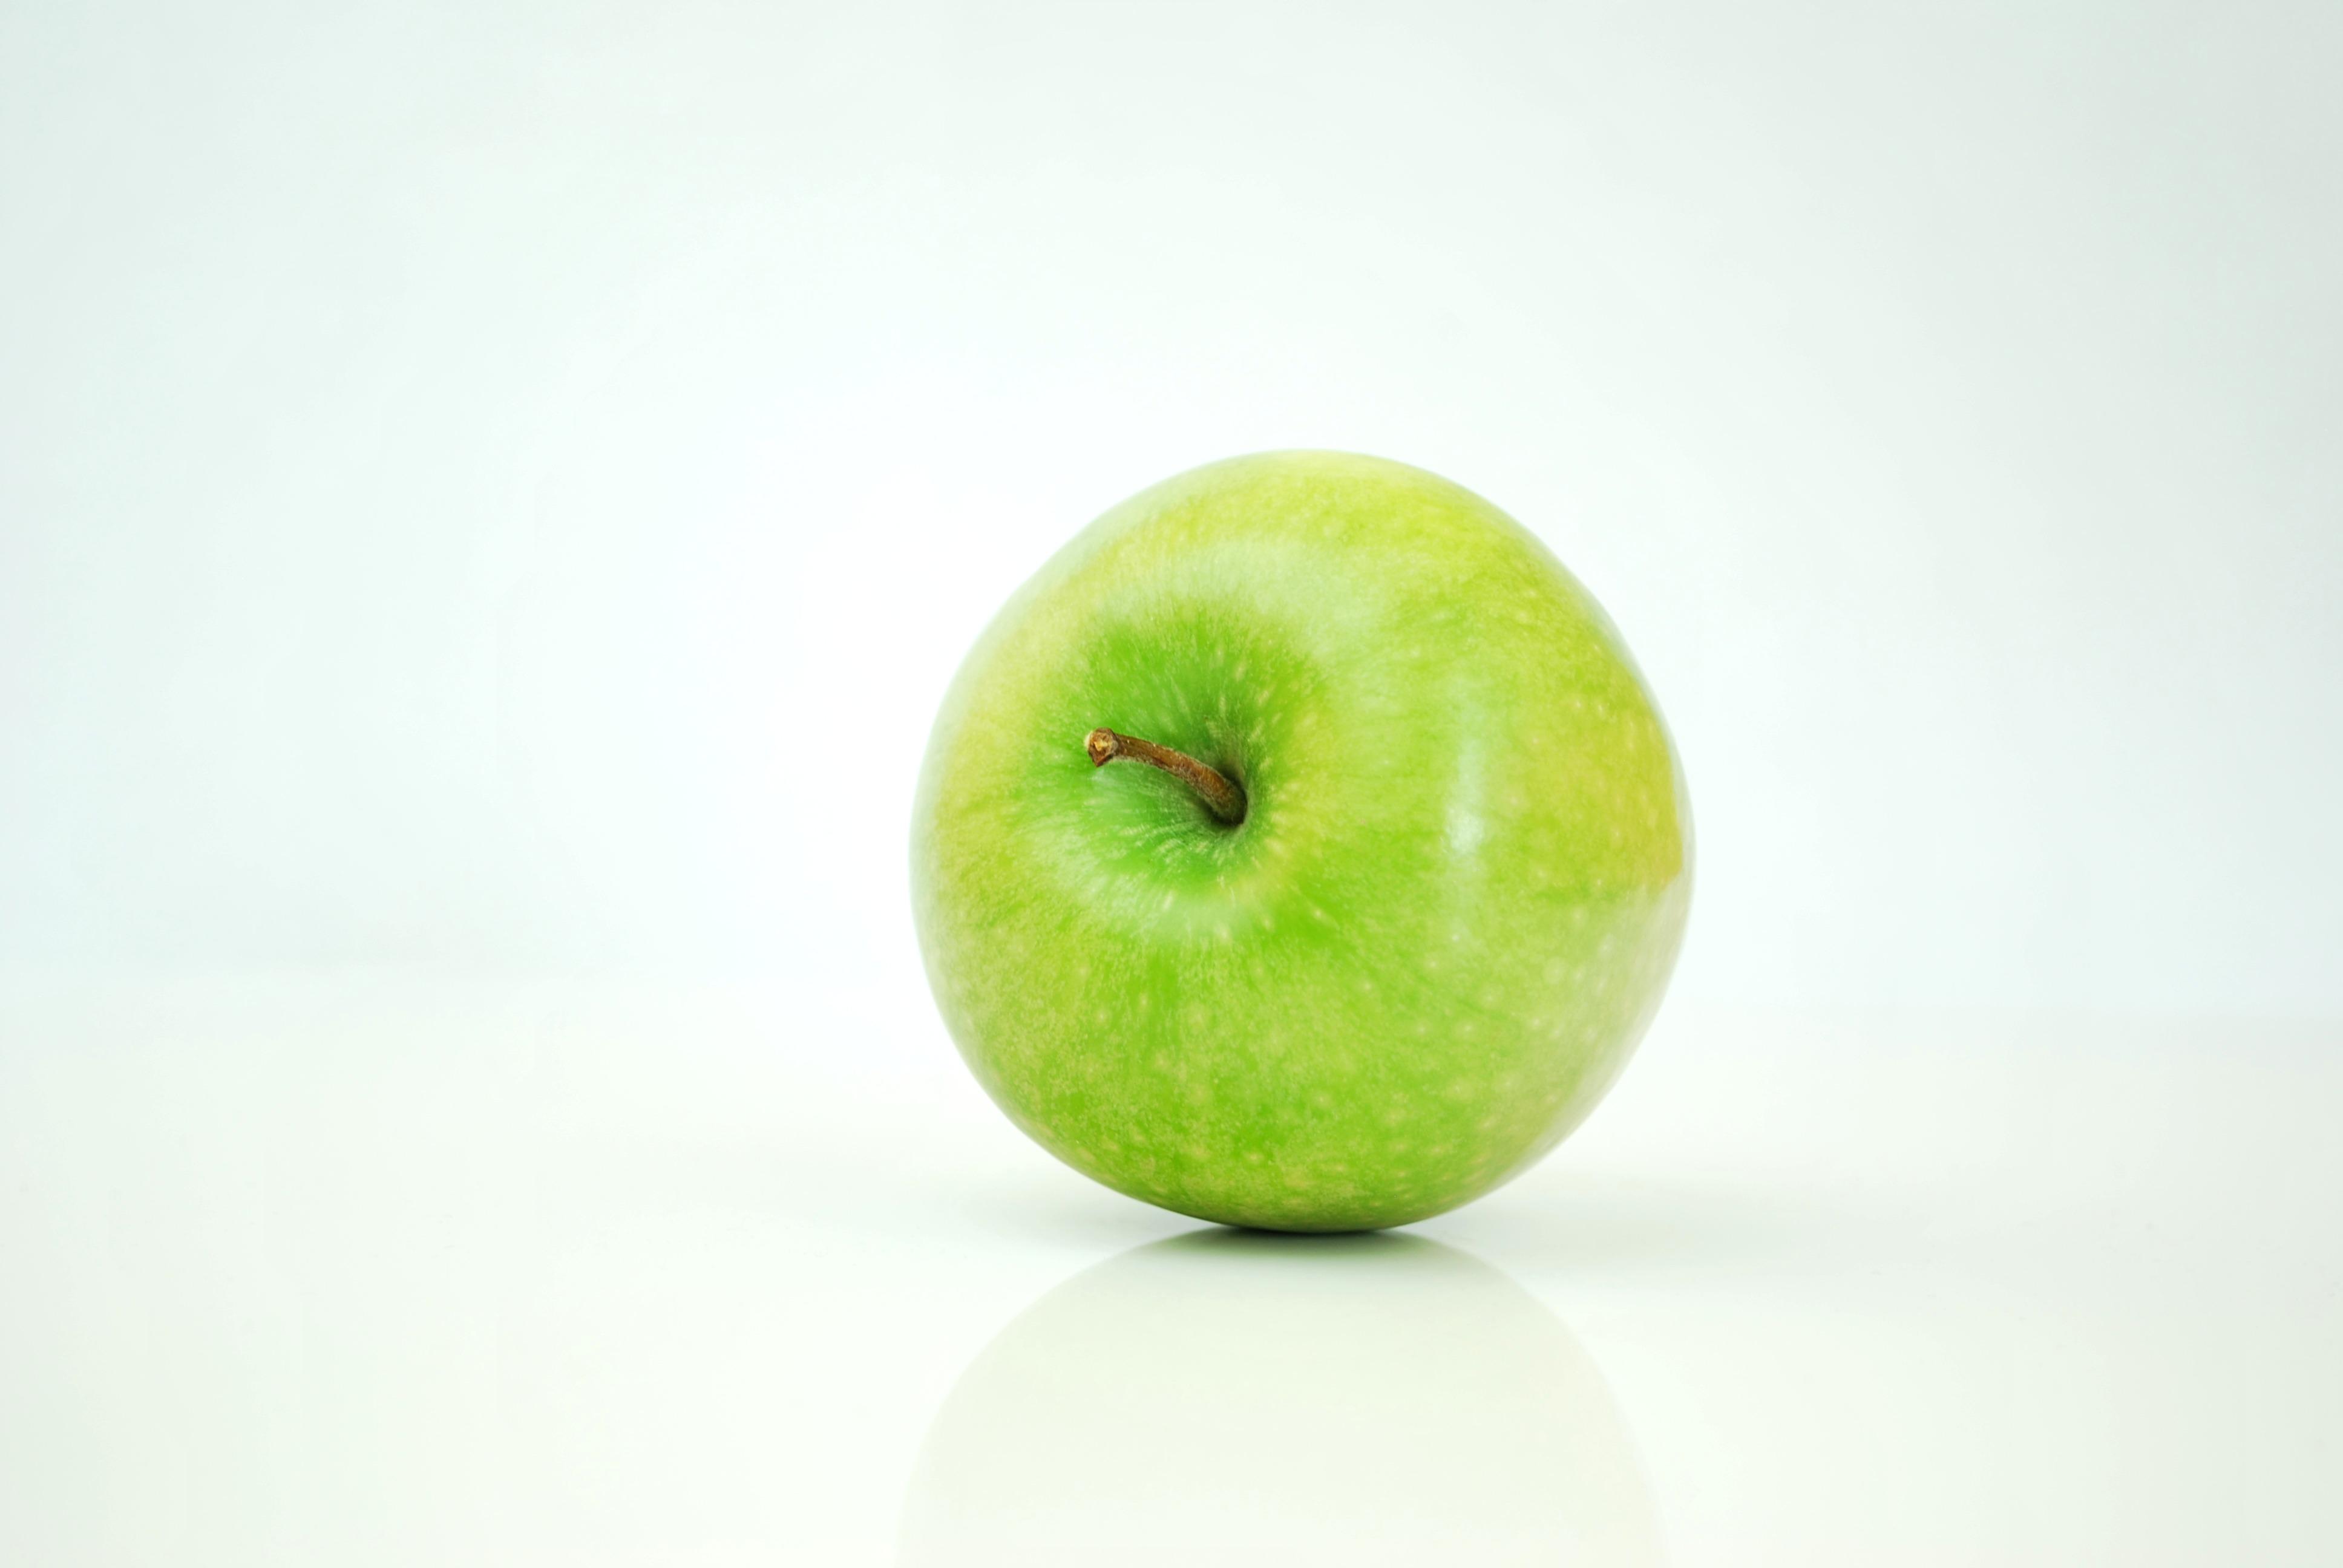 Apple Stock Chart: Green Apple Photo · Free Stock Photo,Chart